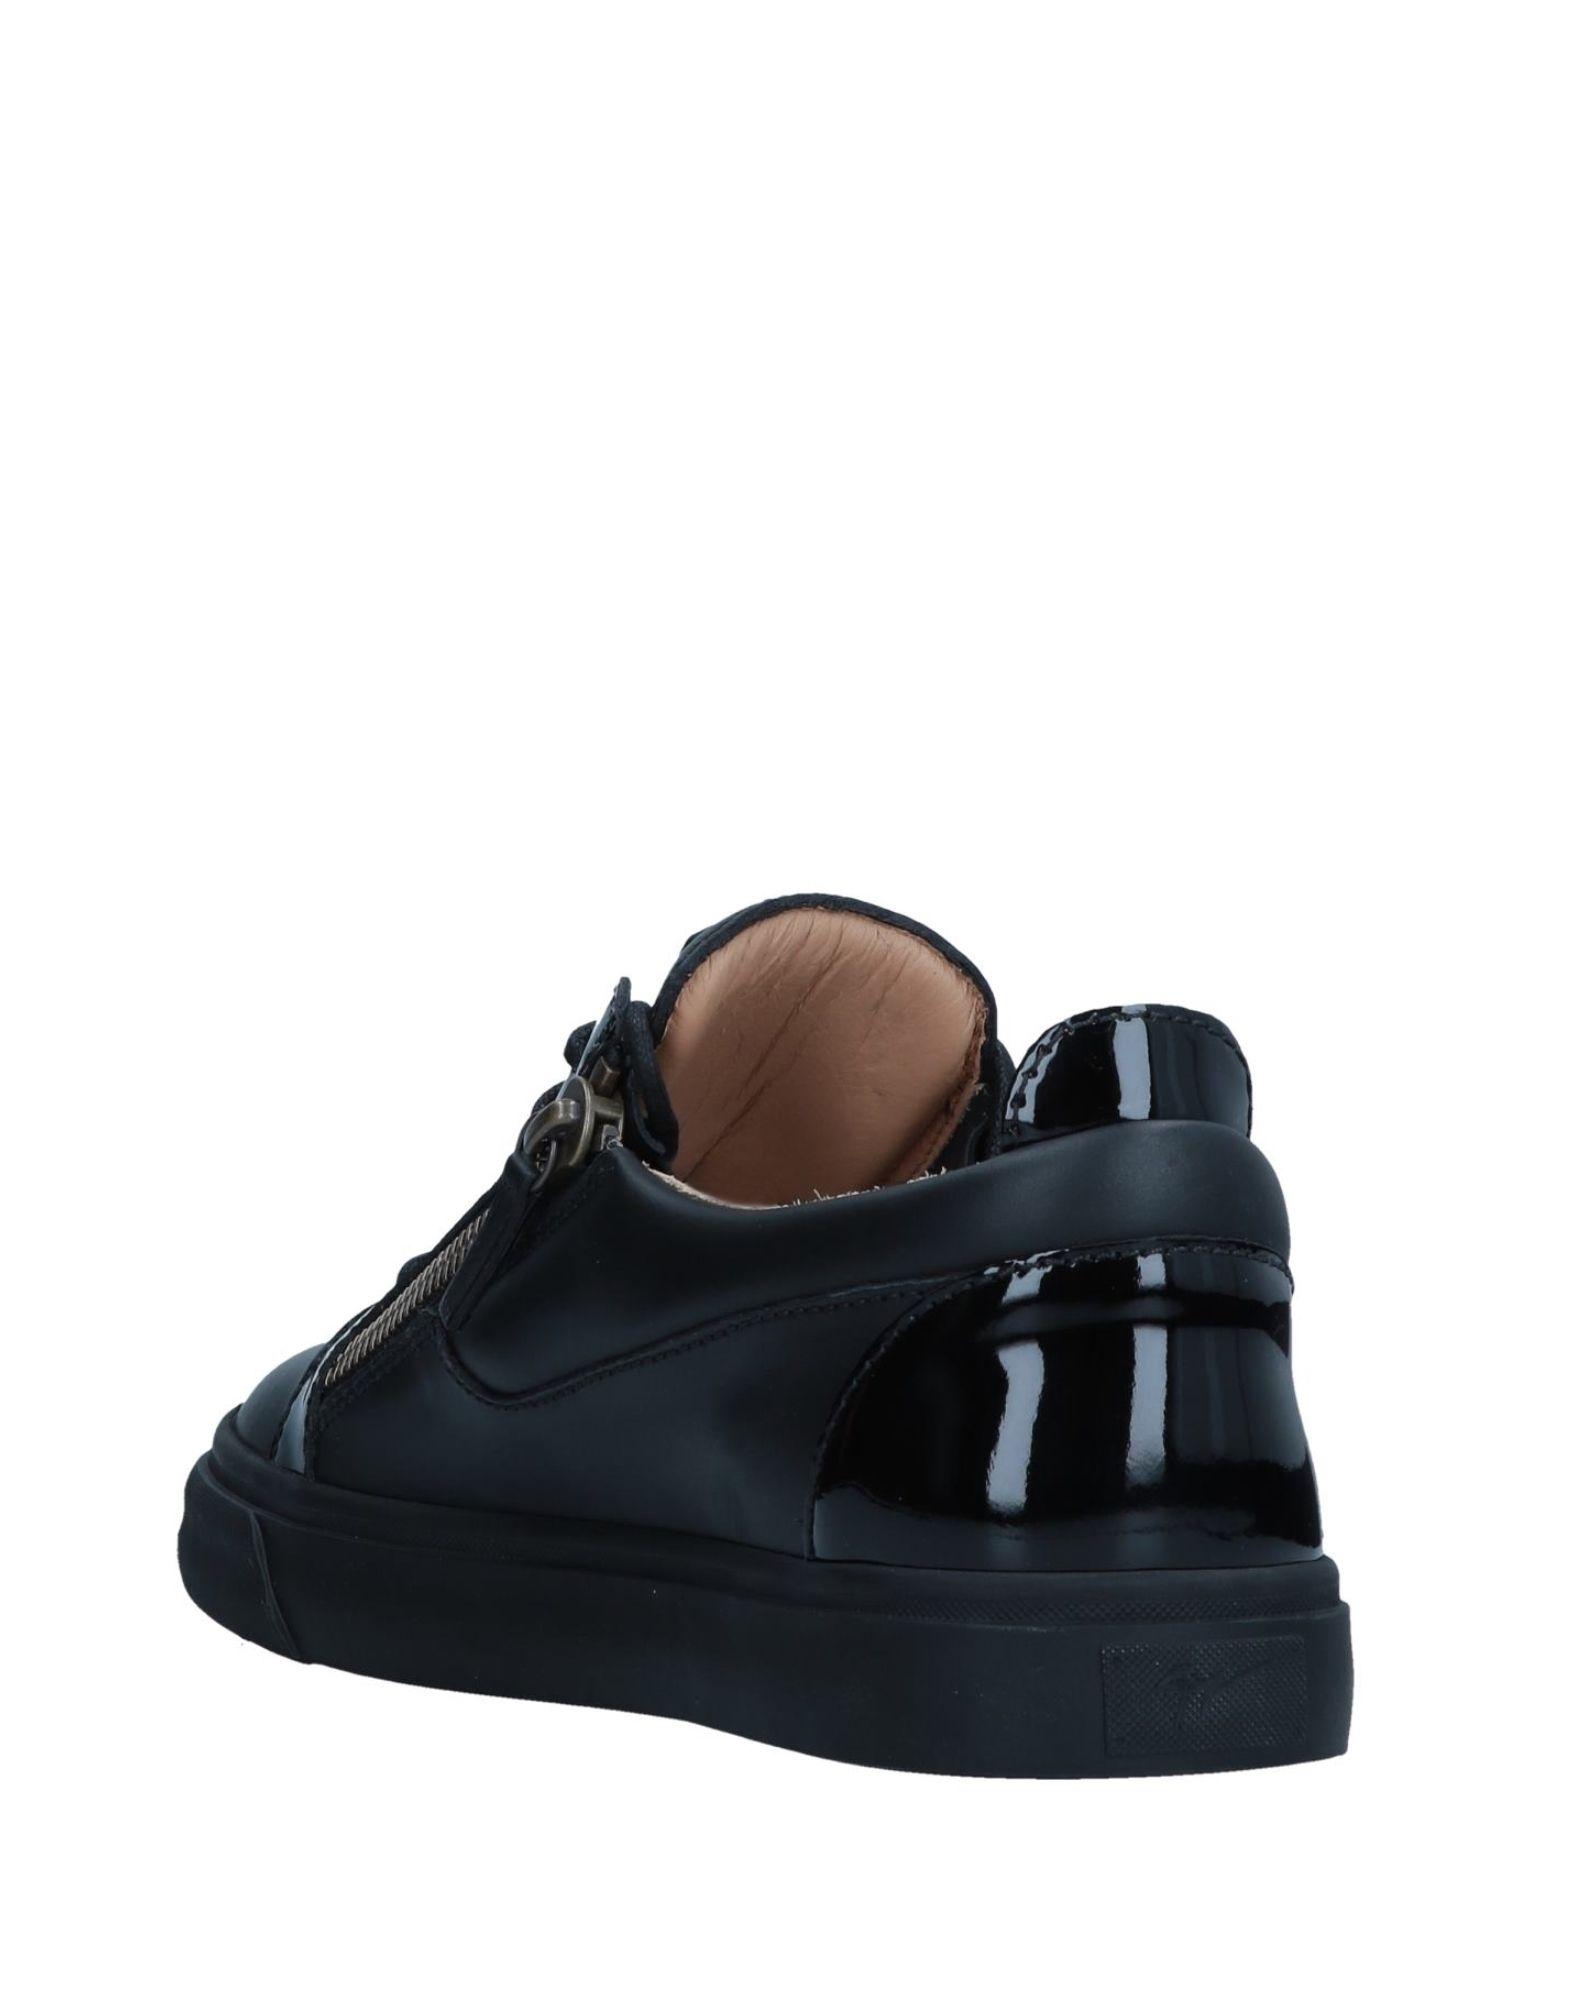 Giuseppe Zanotti Gute Sneakers Herren  11545461FI Gute Zanotti Qualität beliebte Schuhe 82935c